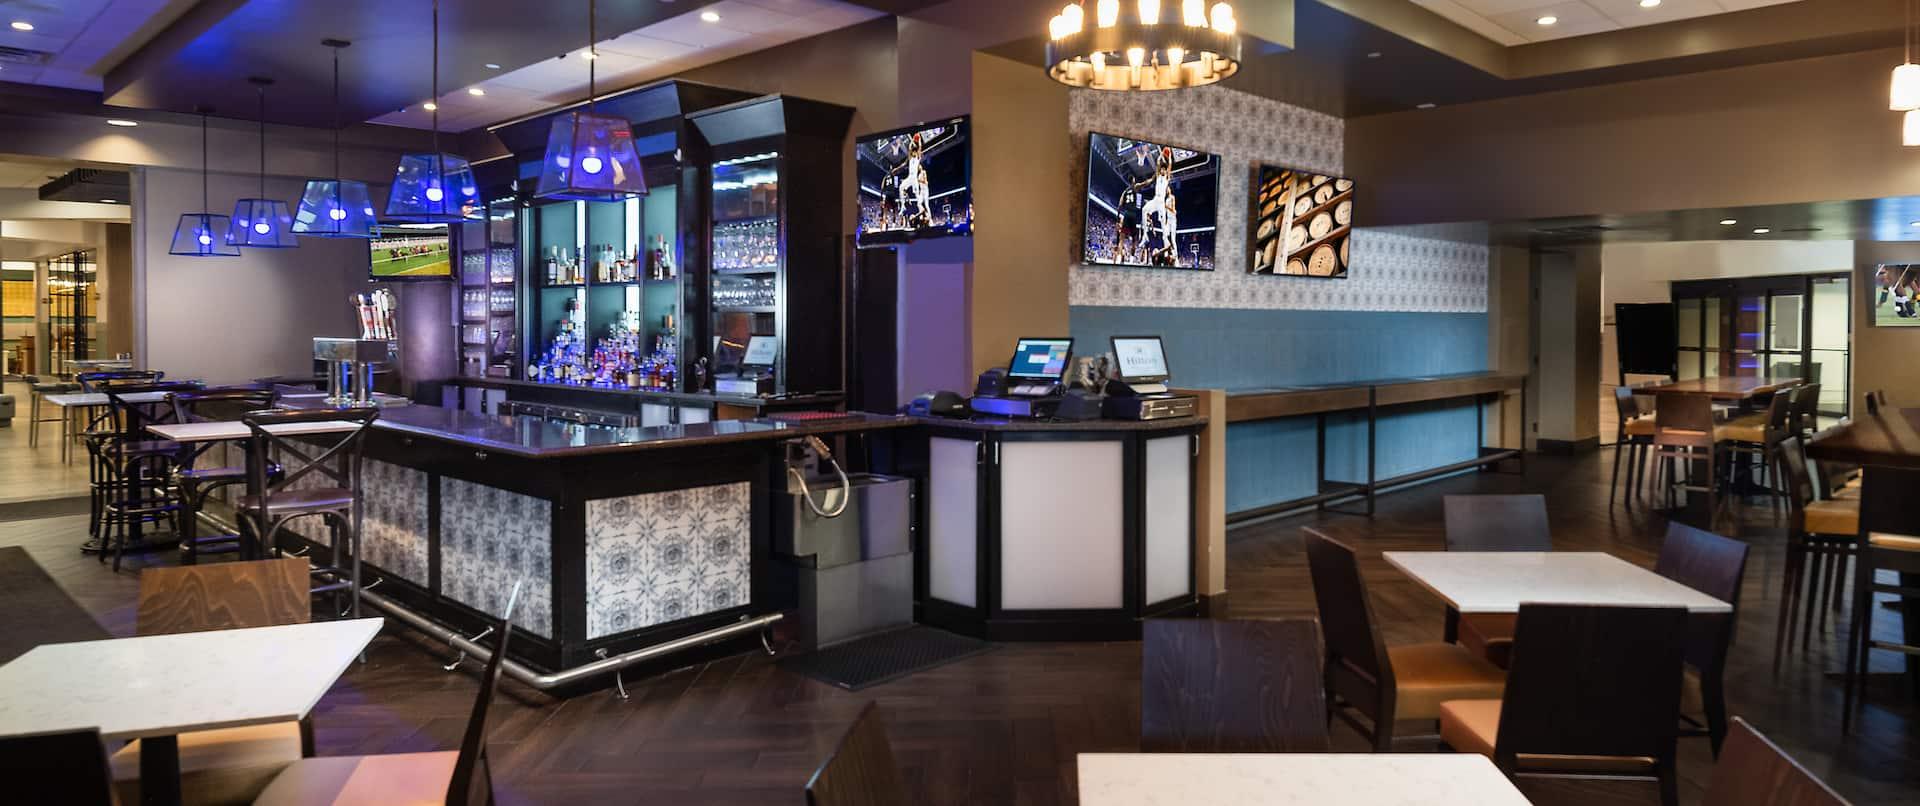 Overview of BBM Bar